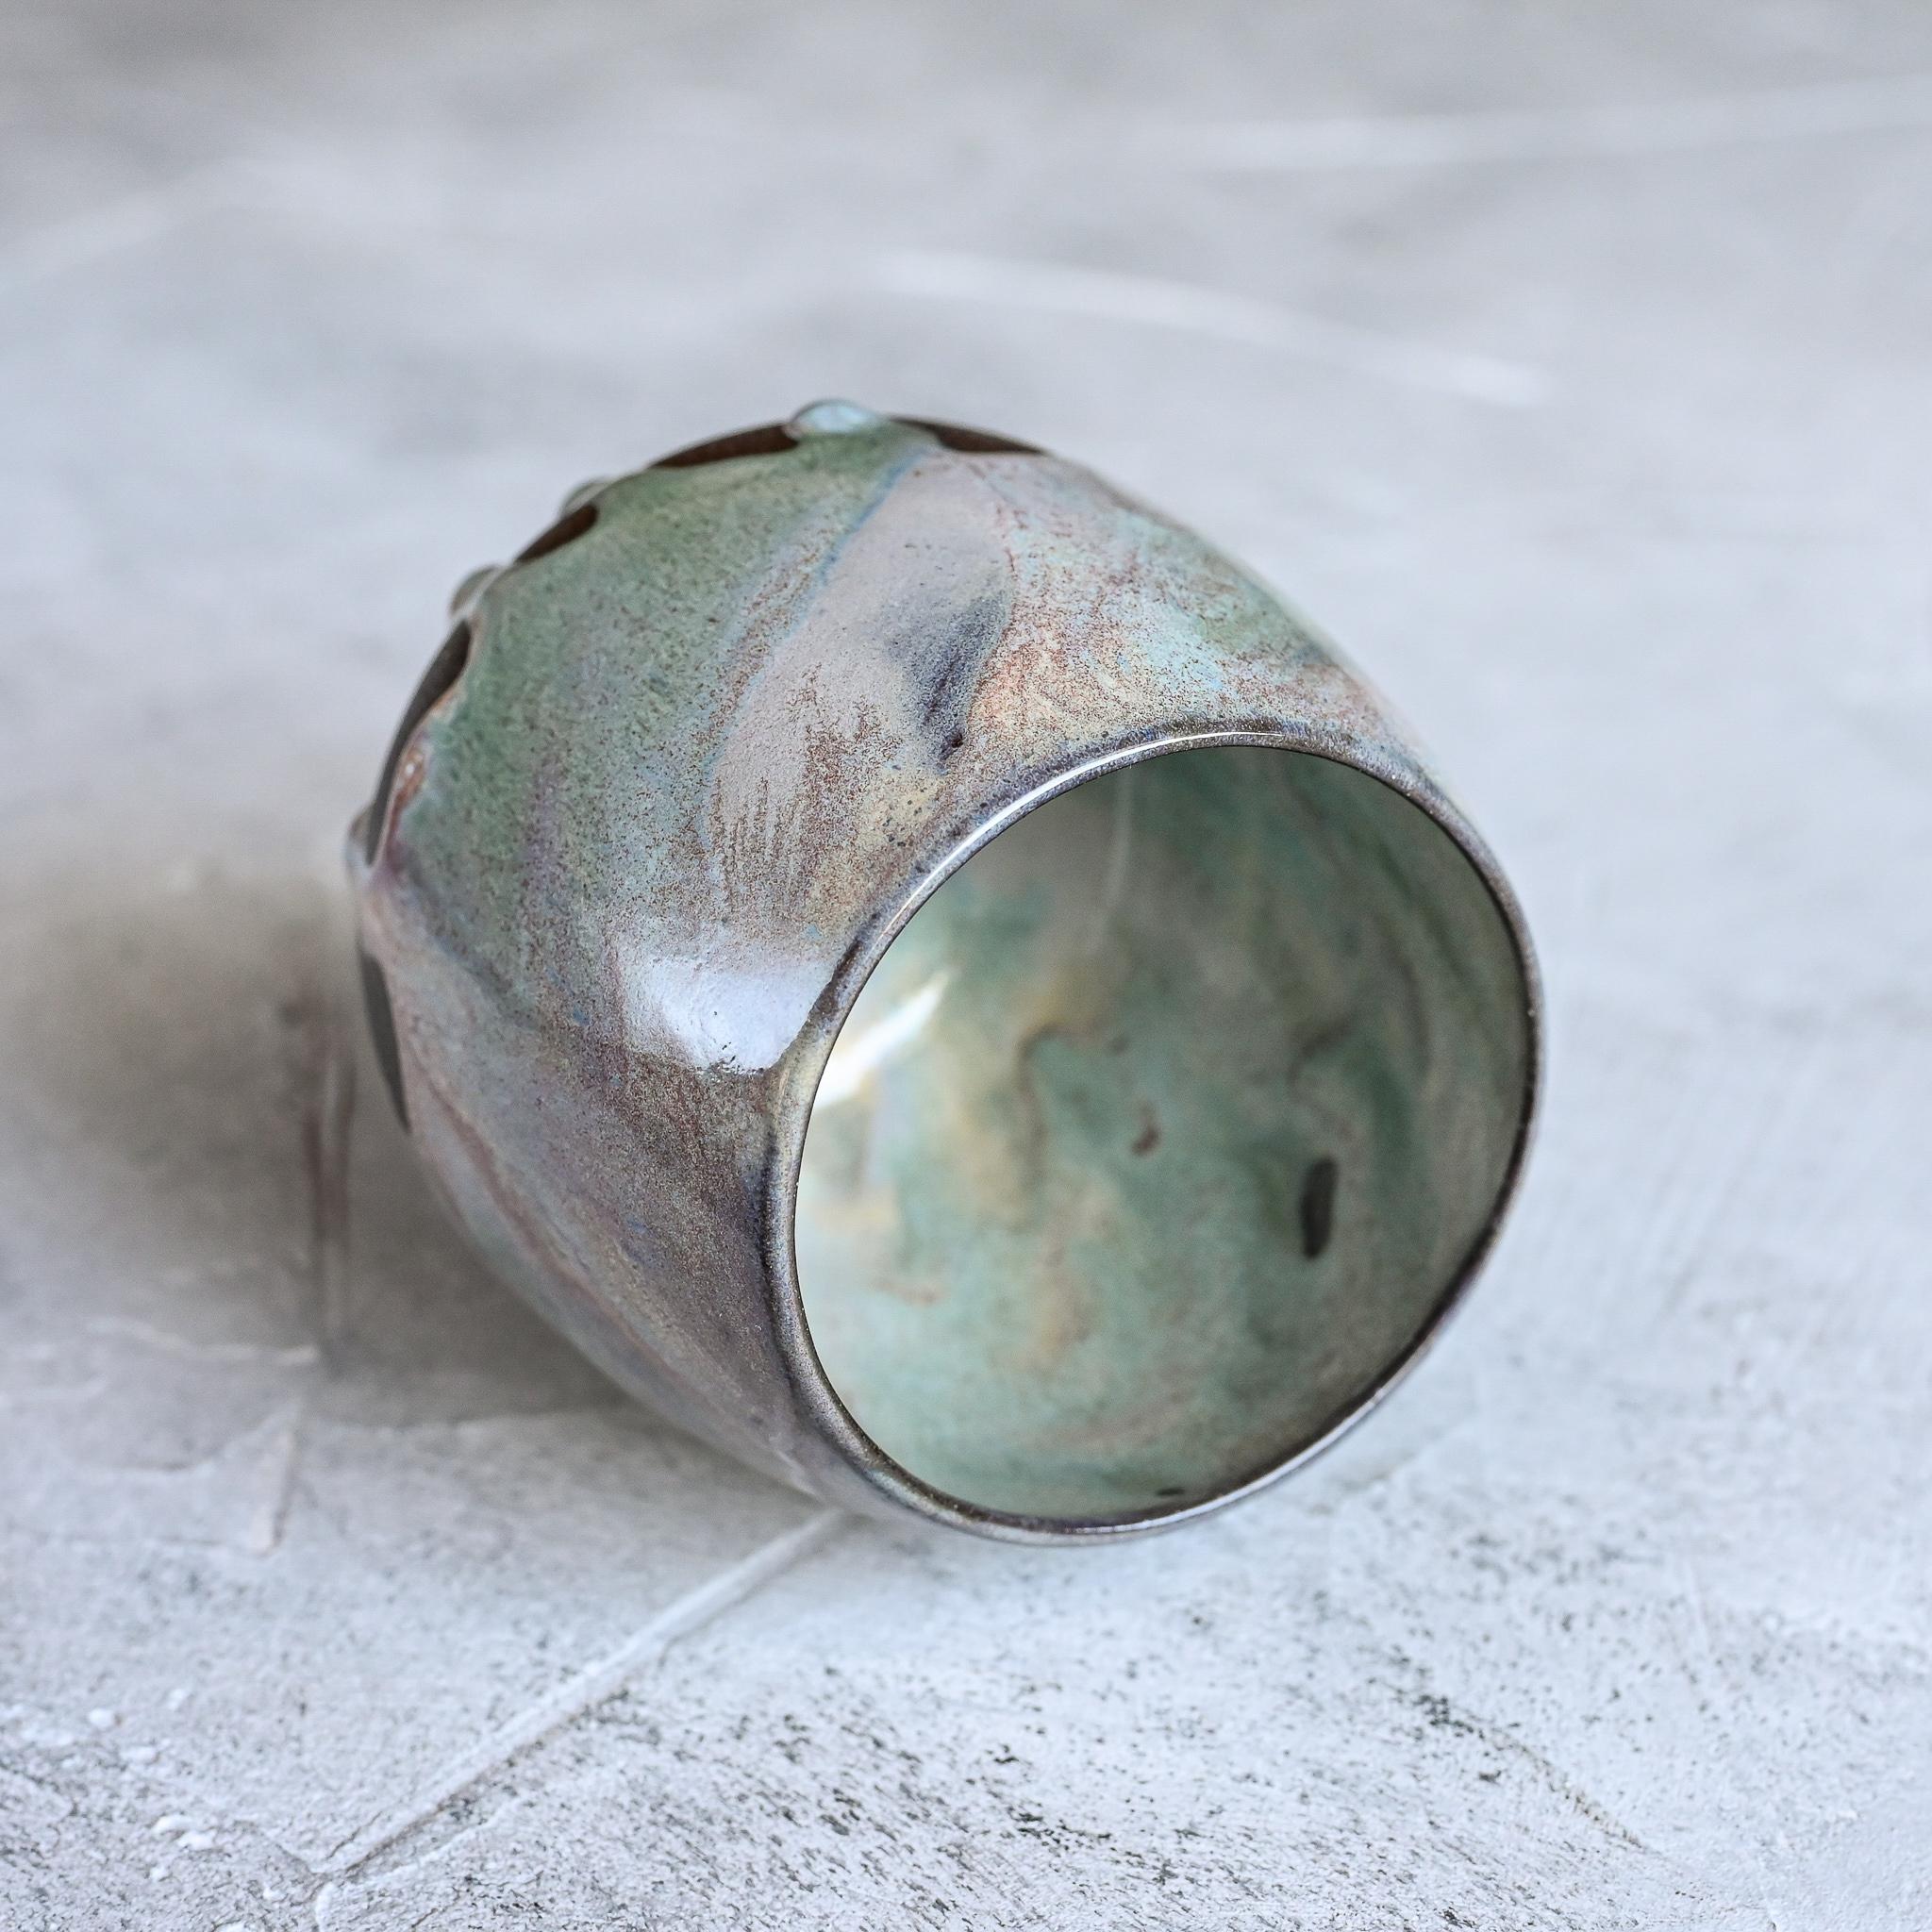 картинка Керамический стакан Марии Левиной 12 - DishWishes.Ru